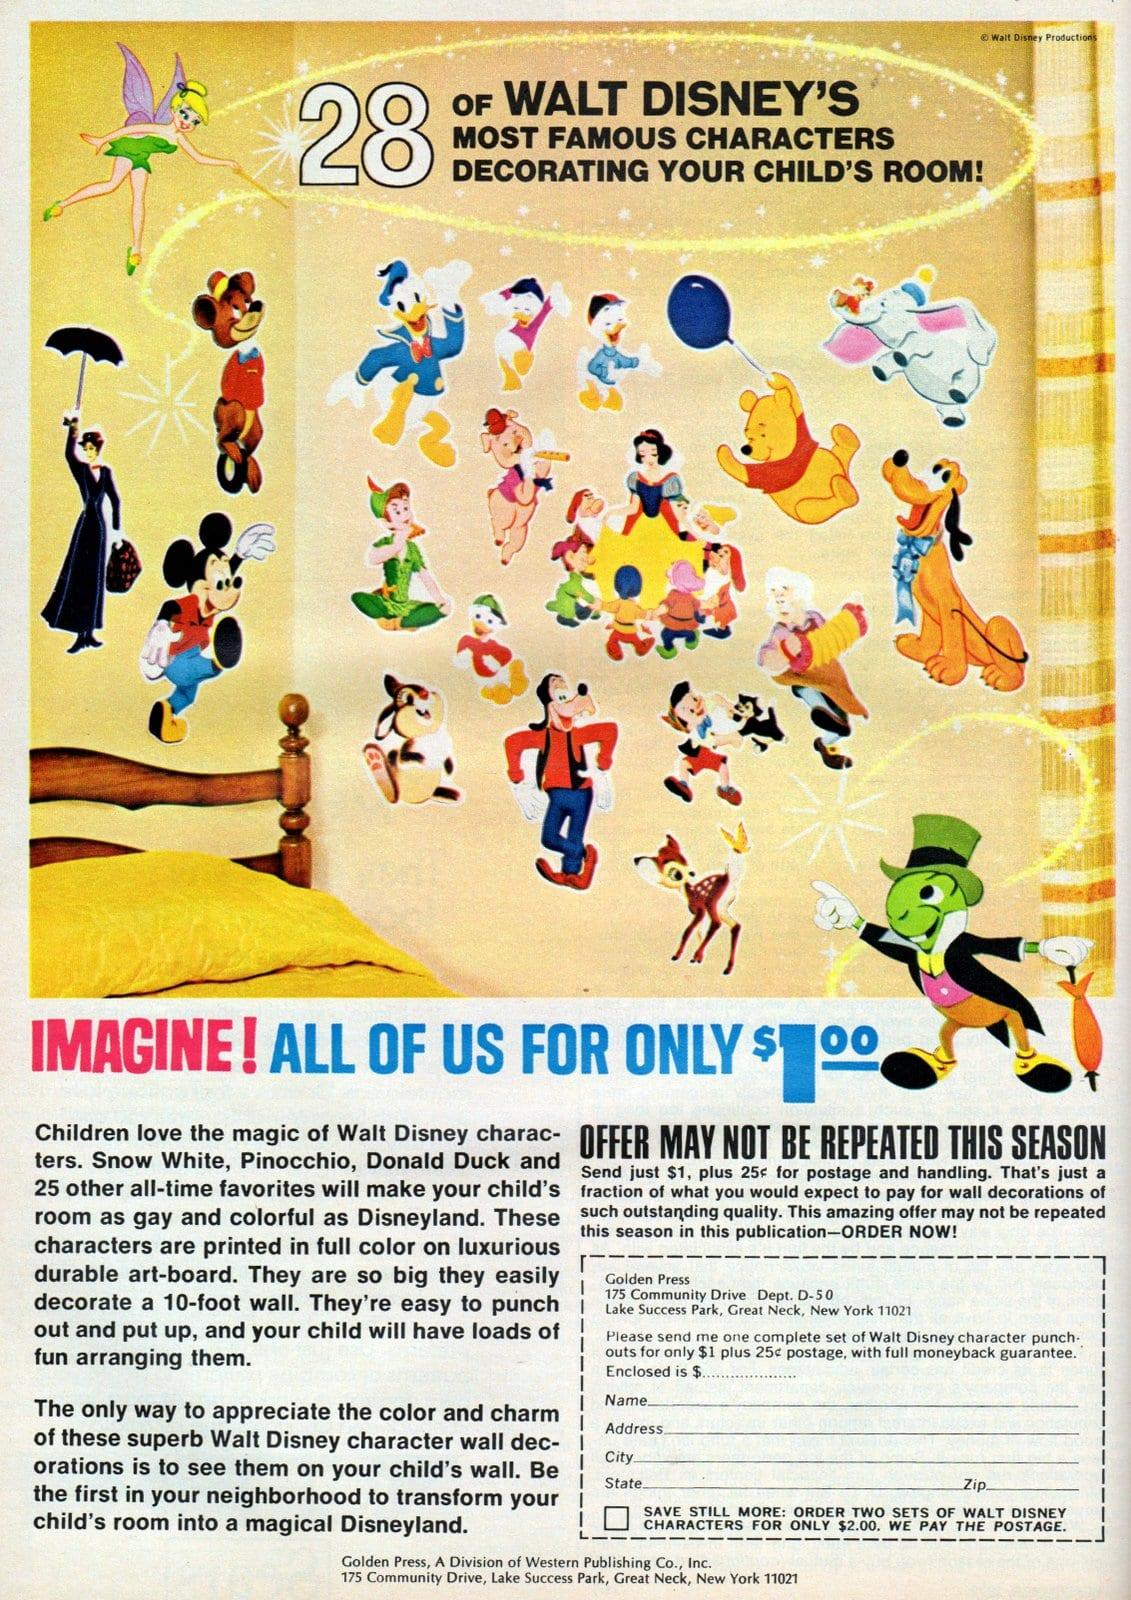 Disney wall stickers - Bedroom decor (1972)